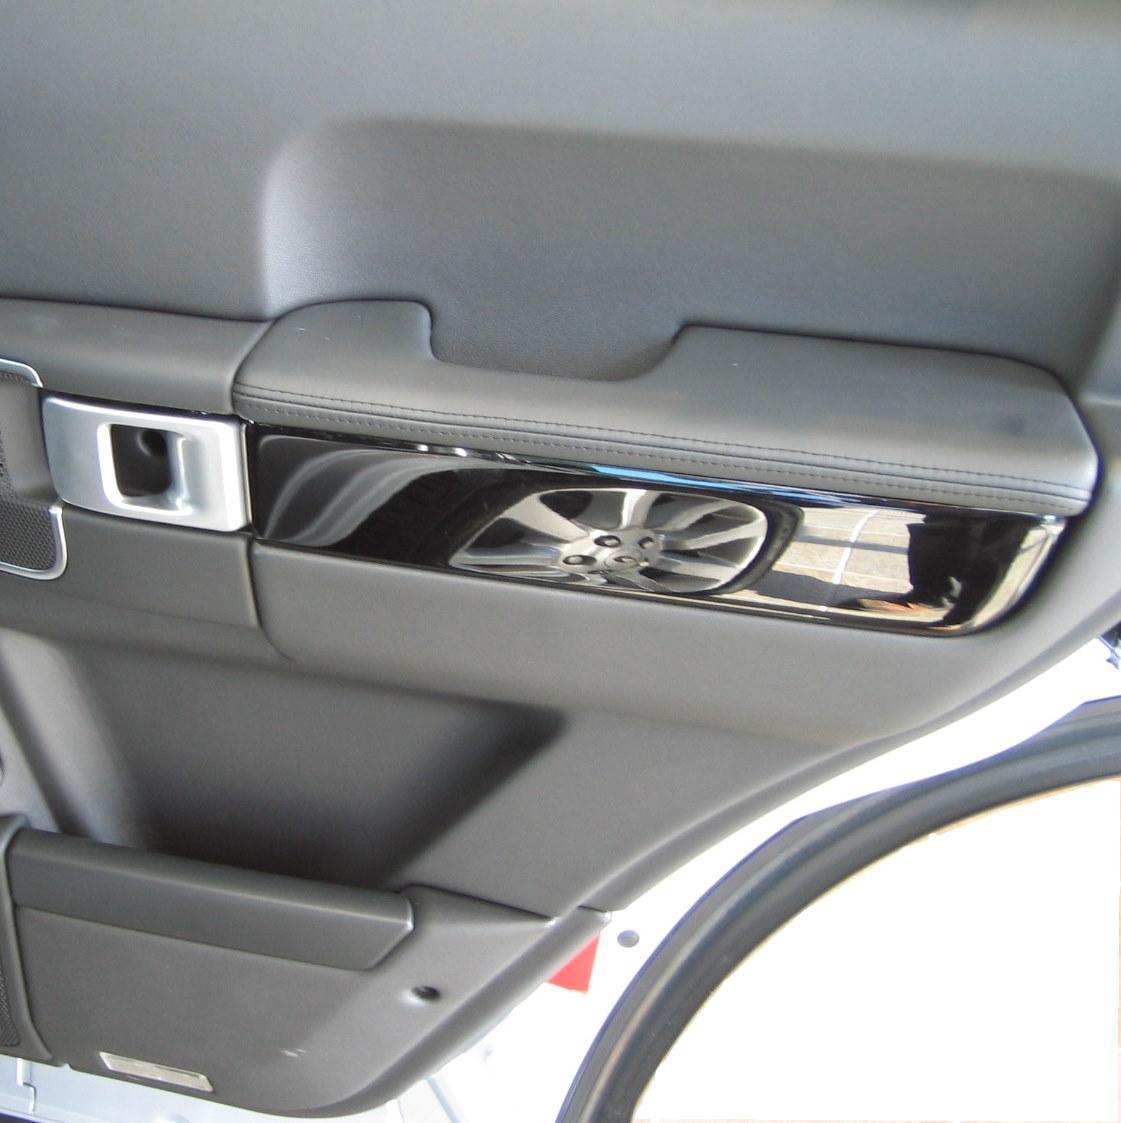 2002 Land Rover Range Rover Interior: Door Card Interior Trim Black Piano Range Rover L322 2006